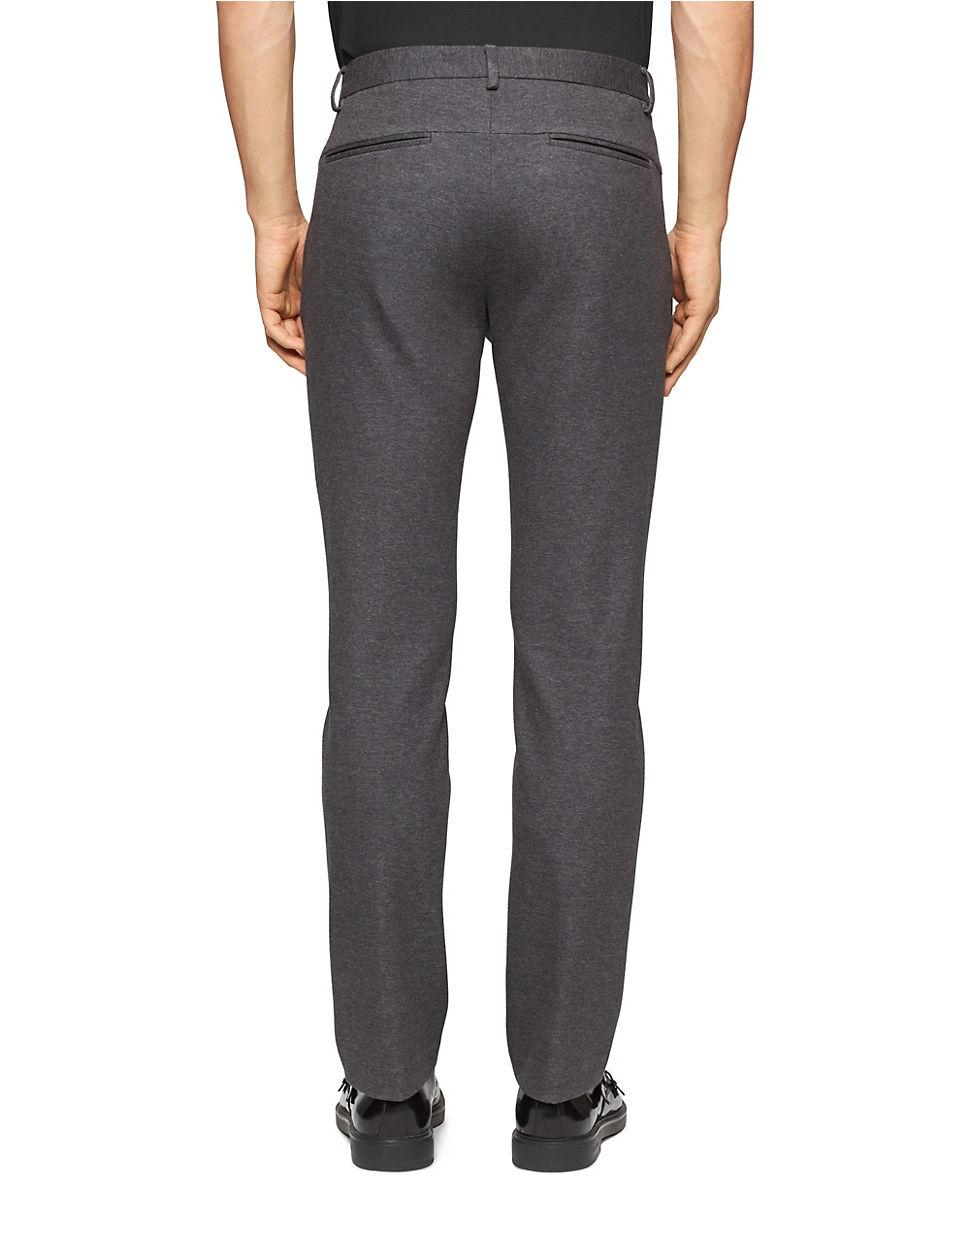 Calvin klein Slim Fit Knit Dress Pants in Gray for Men | Lyst